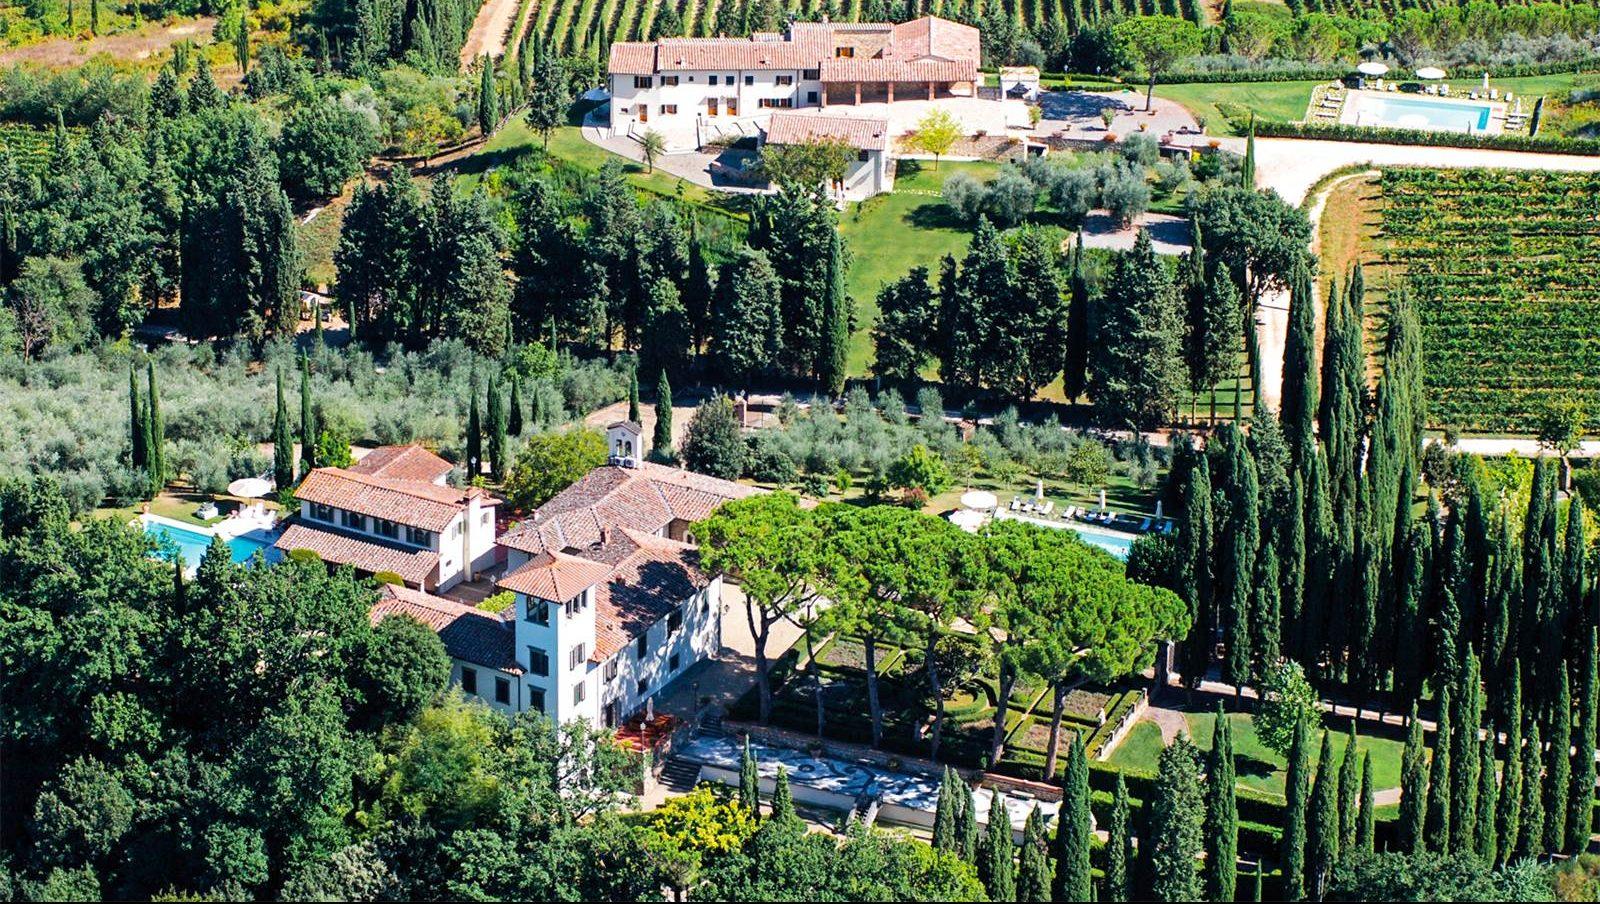 "<a href=""http://www.christiesrealestate.com/eng/sales/detail/170-l-78074-1509251005568011/tuscan-chianti-estate-san-casciano-in-val-di-pesa-fi"" target=""_blank"">(Christie's International Real Estate)</a>"